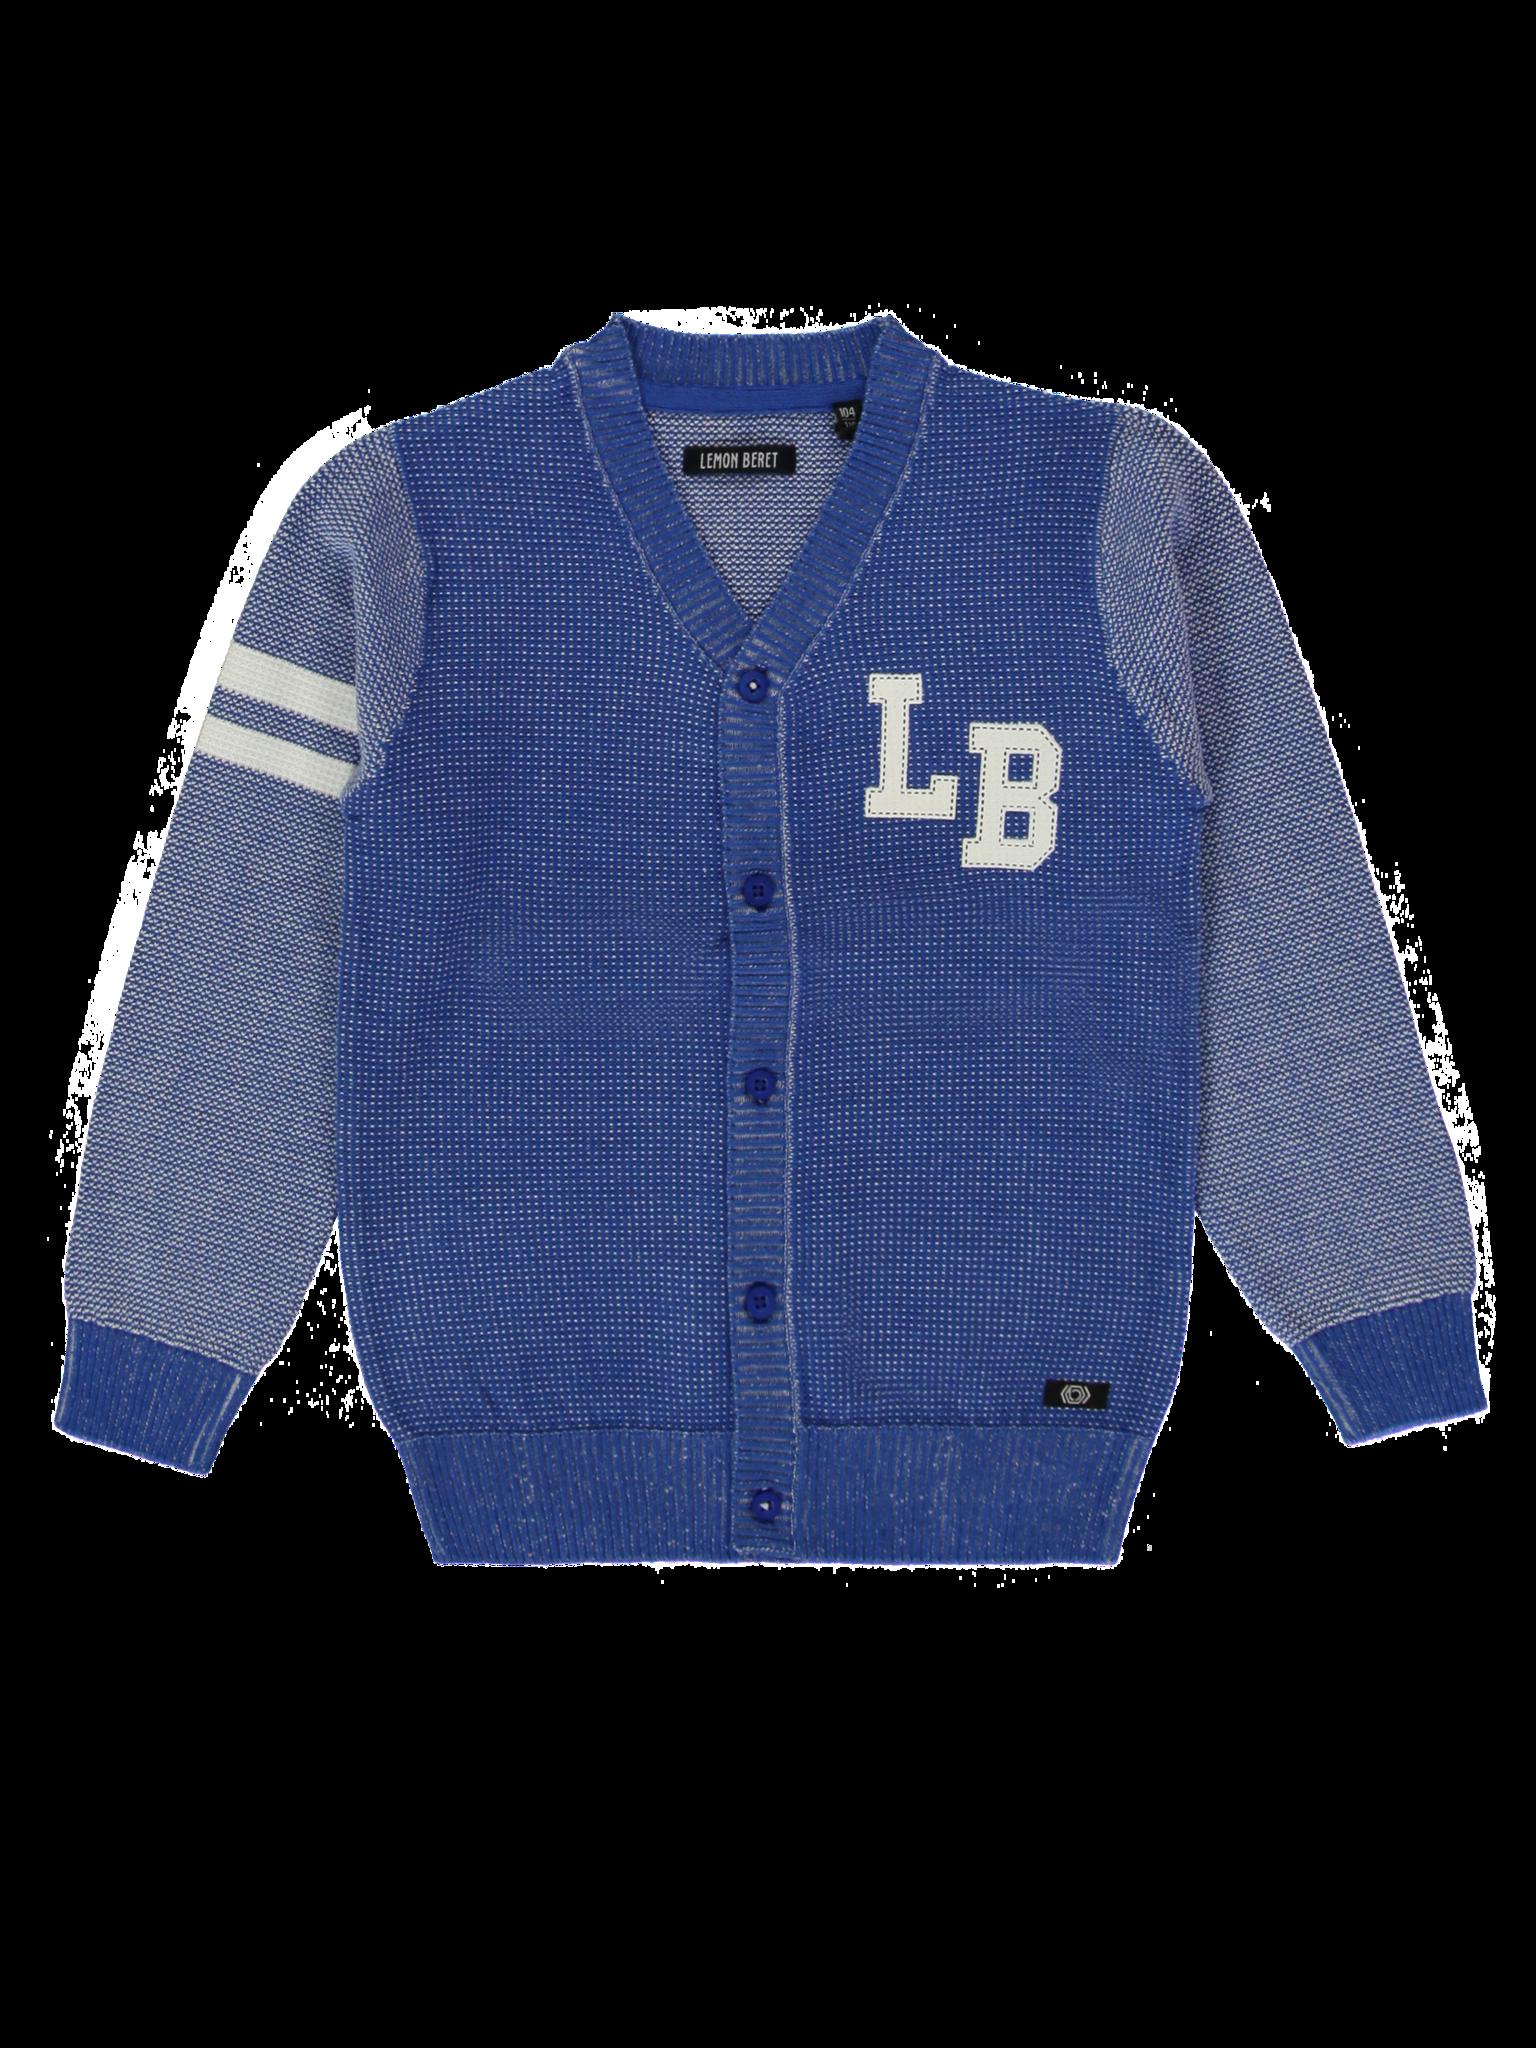 All Brands | Summerproducts Small Boys | Cardigan Knitwear | 10 pcs/box